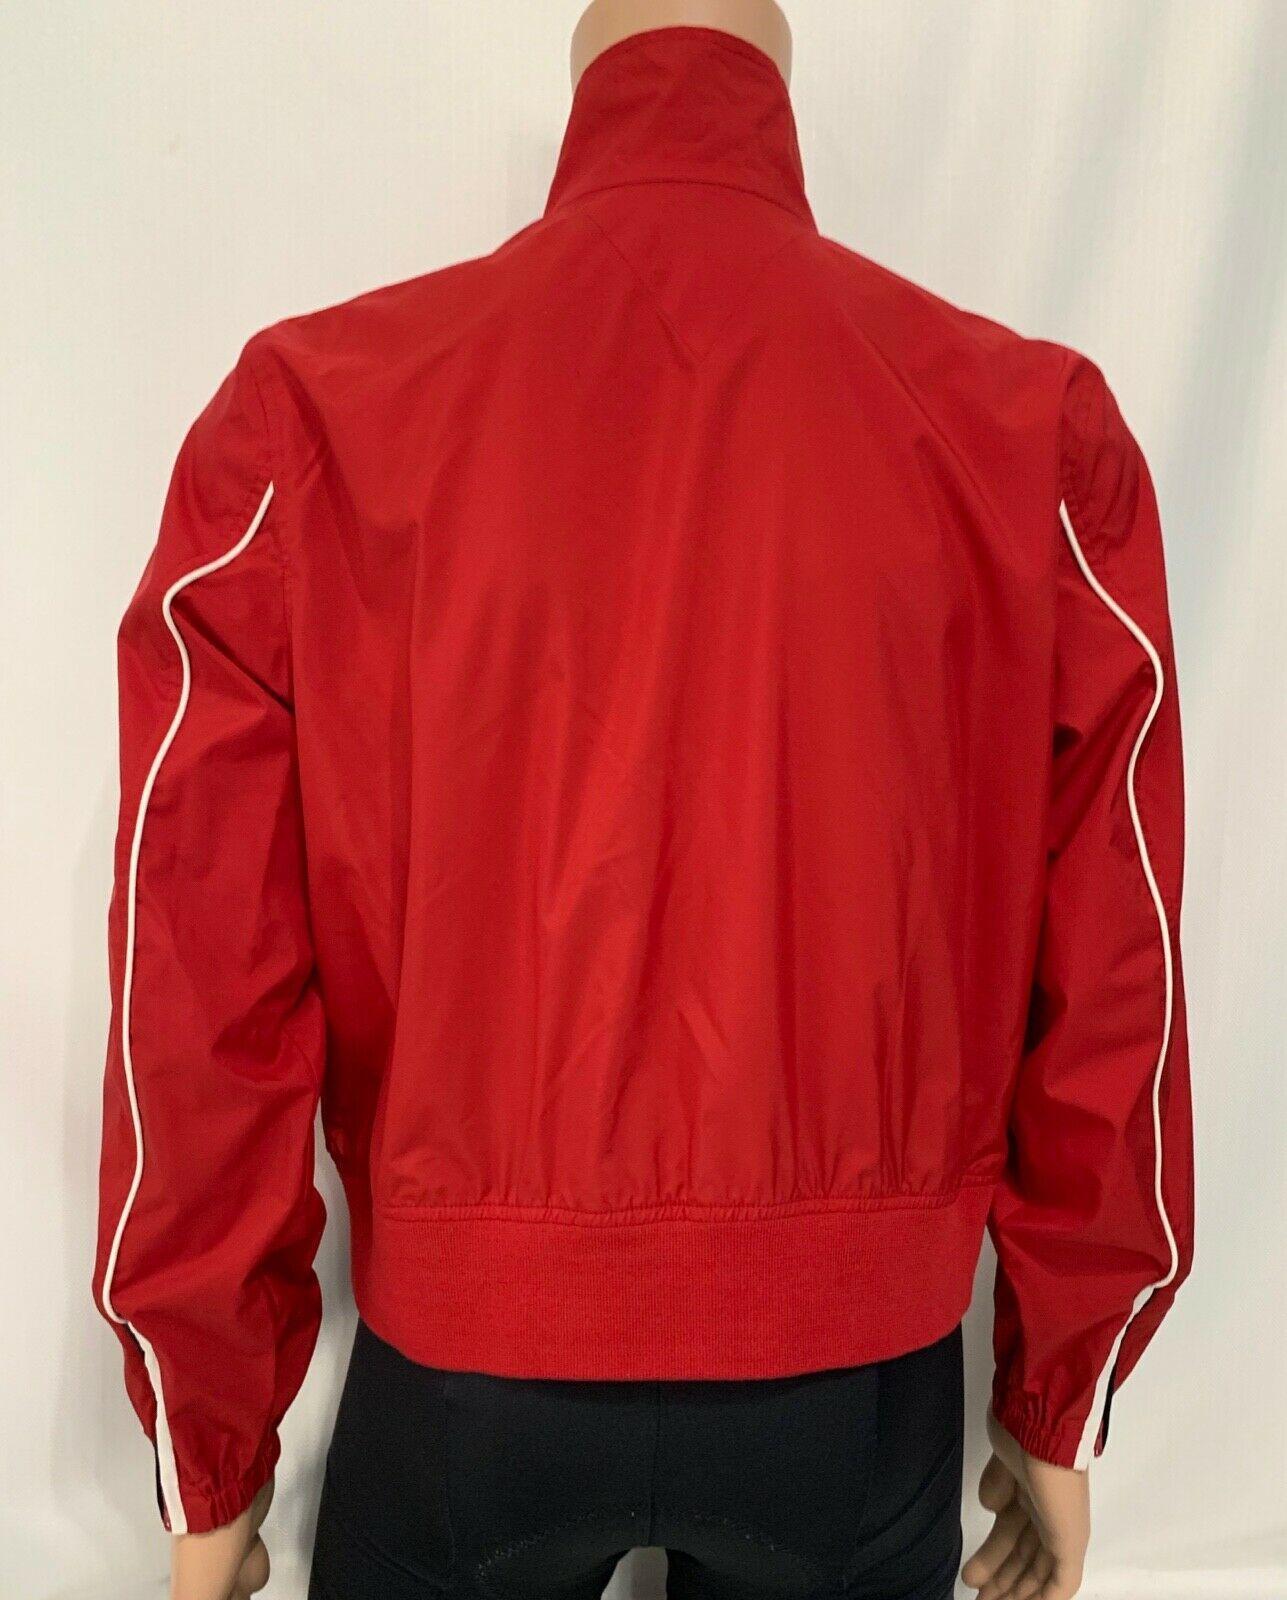 Women TOMMY HILFIGER Jeans RAIN Jacket Coat Windbreaker Pockets RED No Lining XL image 2